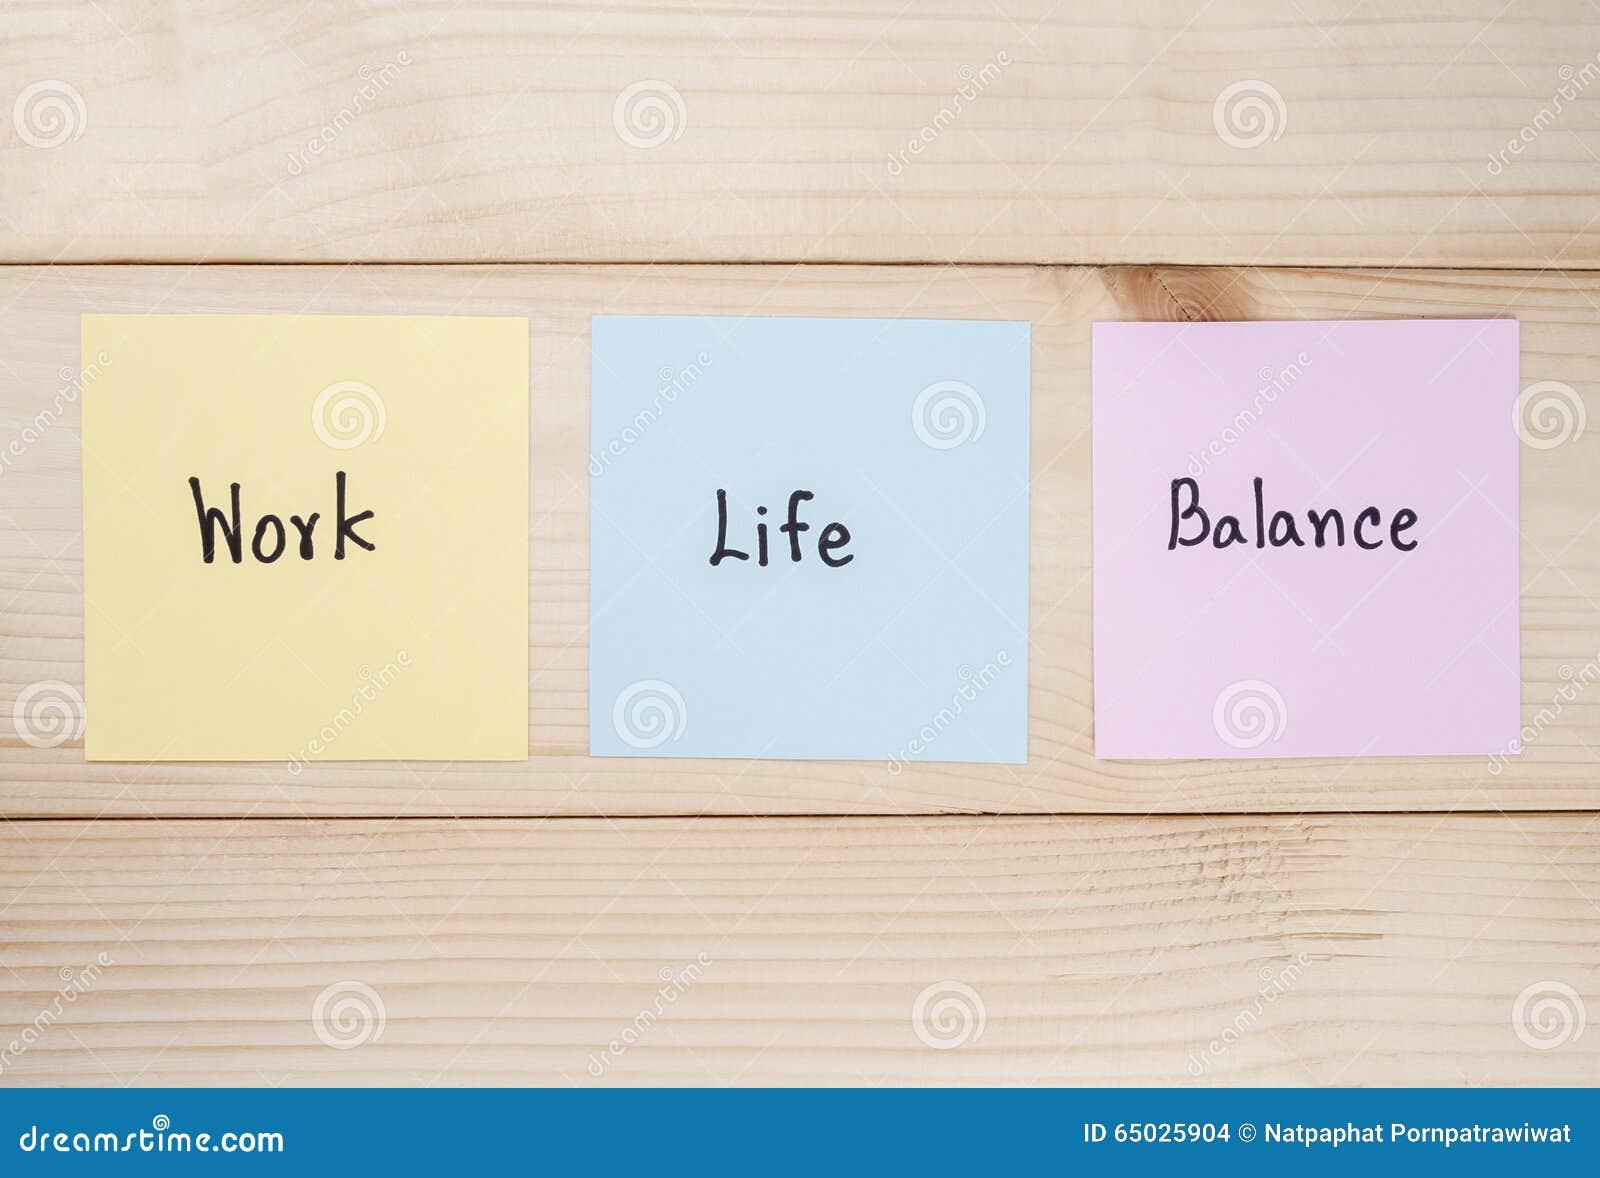 Work life 7